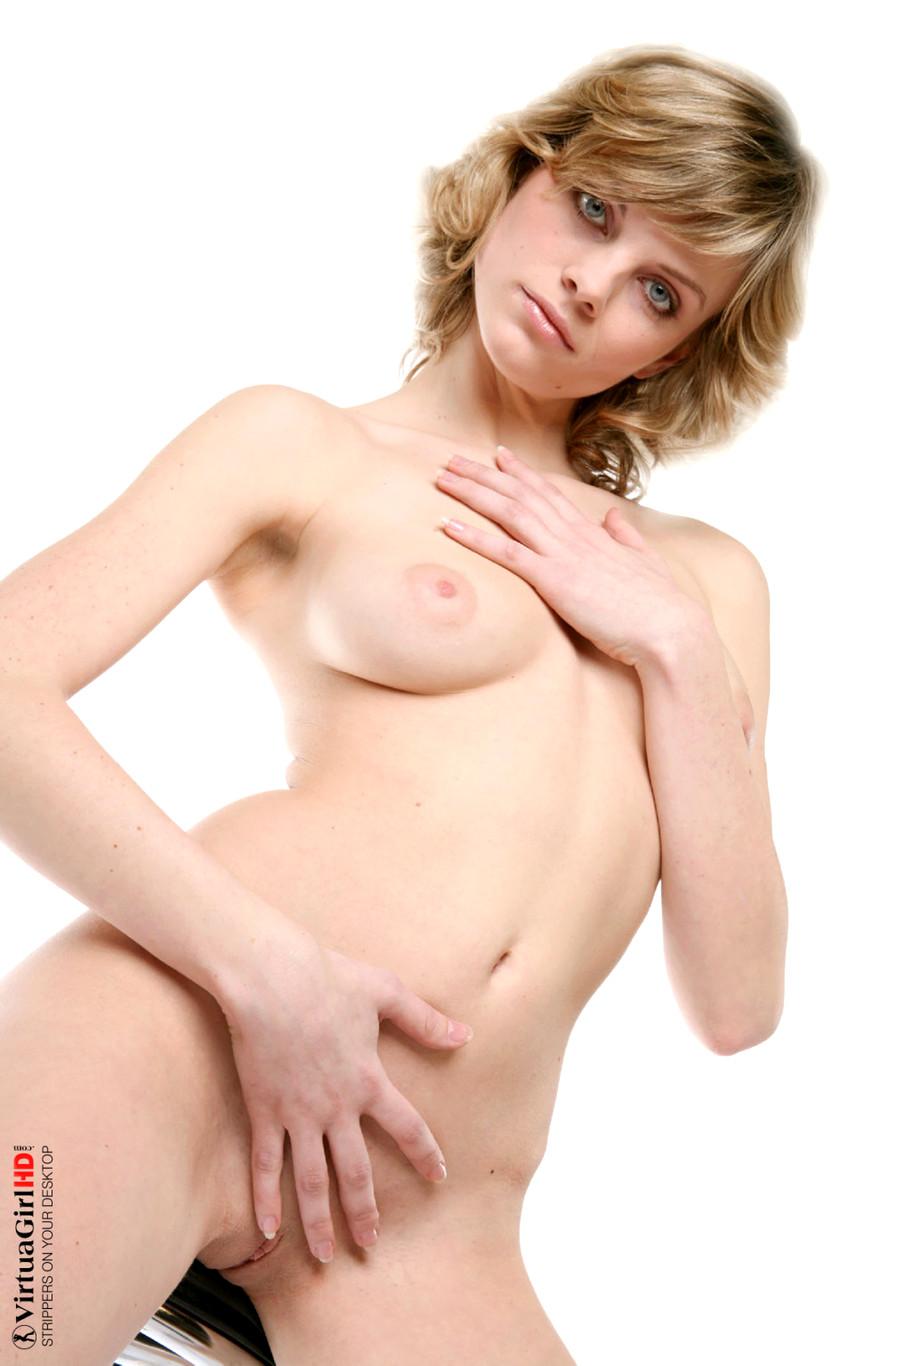 Virtuagirlhd Maggie Beckinsale Blonde Bikini Babe Porn Pics 2